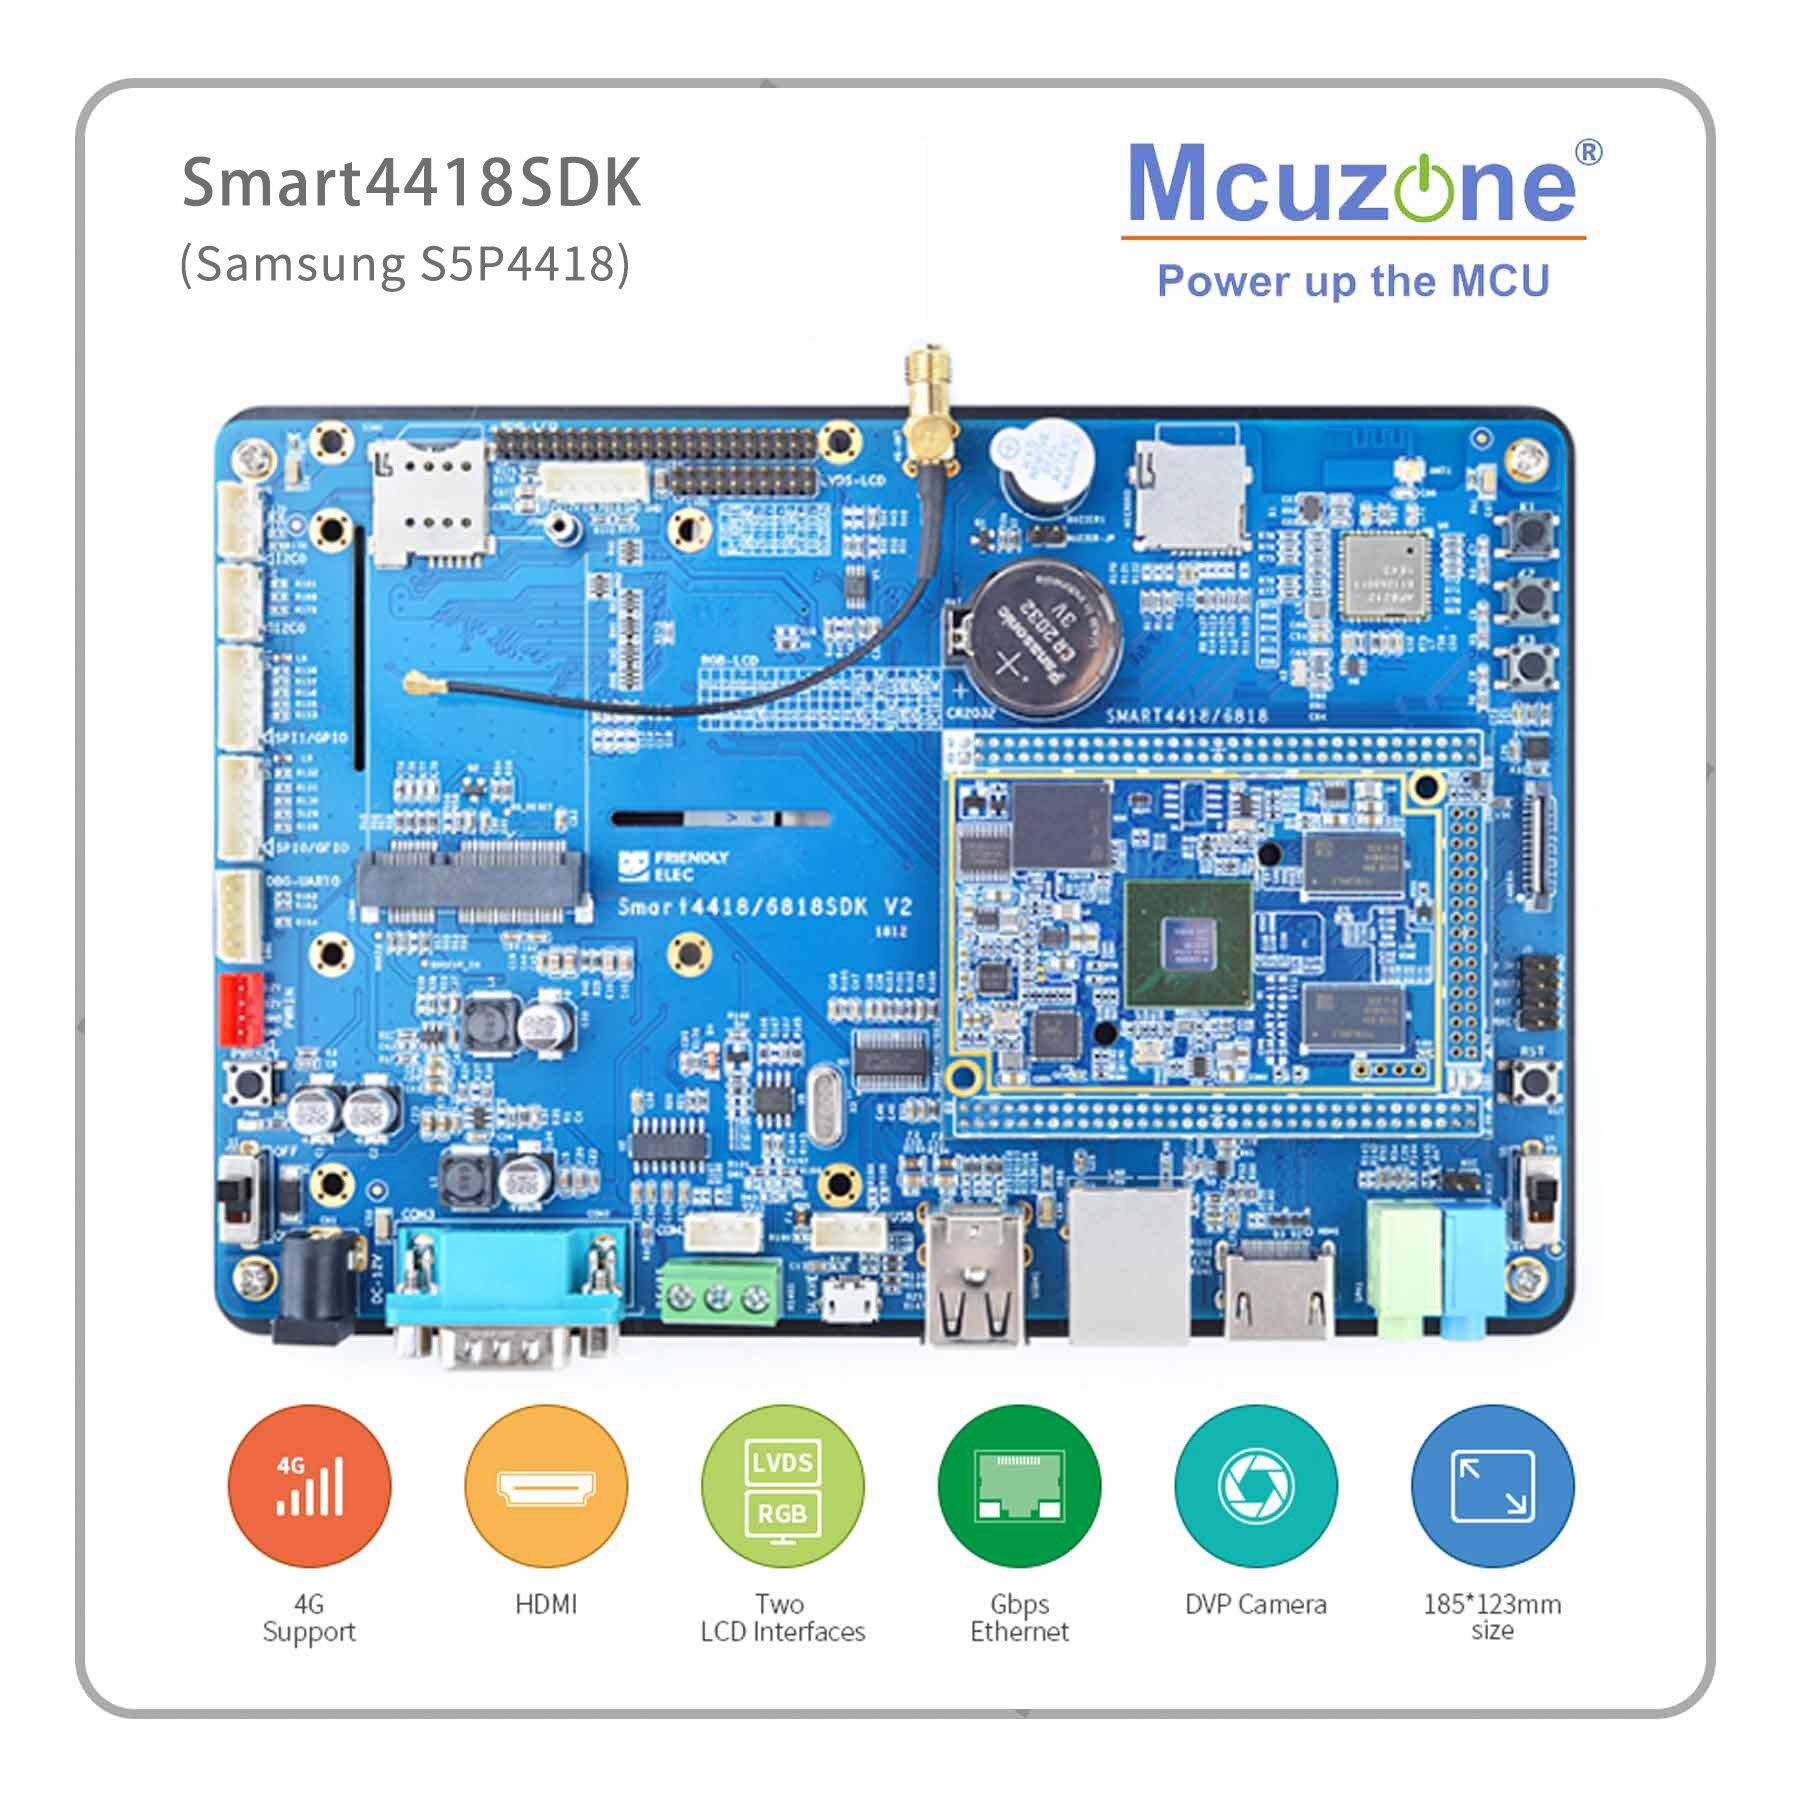 Smart4418SDK Demo- Board S5P4418 1GB DDR3 8GB EMMC Friendlyarm 4G  7'TFT LCD 800*480 800*1280 Capacitive Screen HDMI